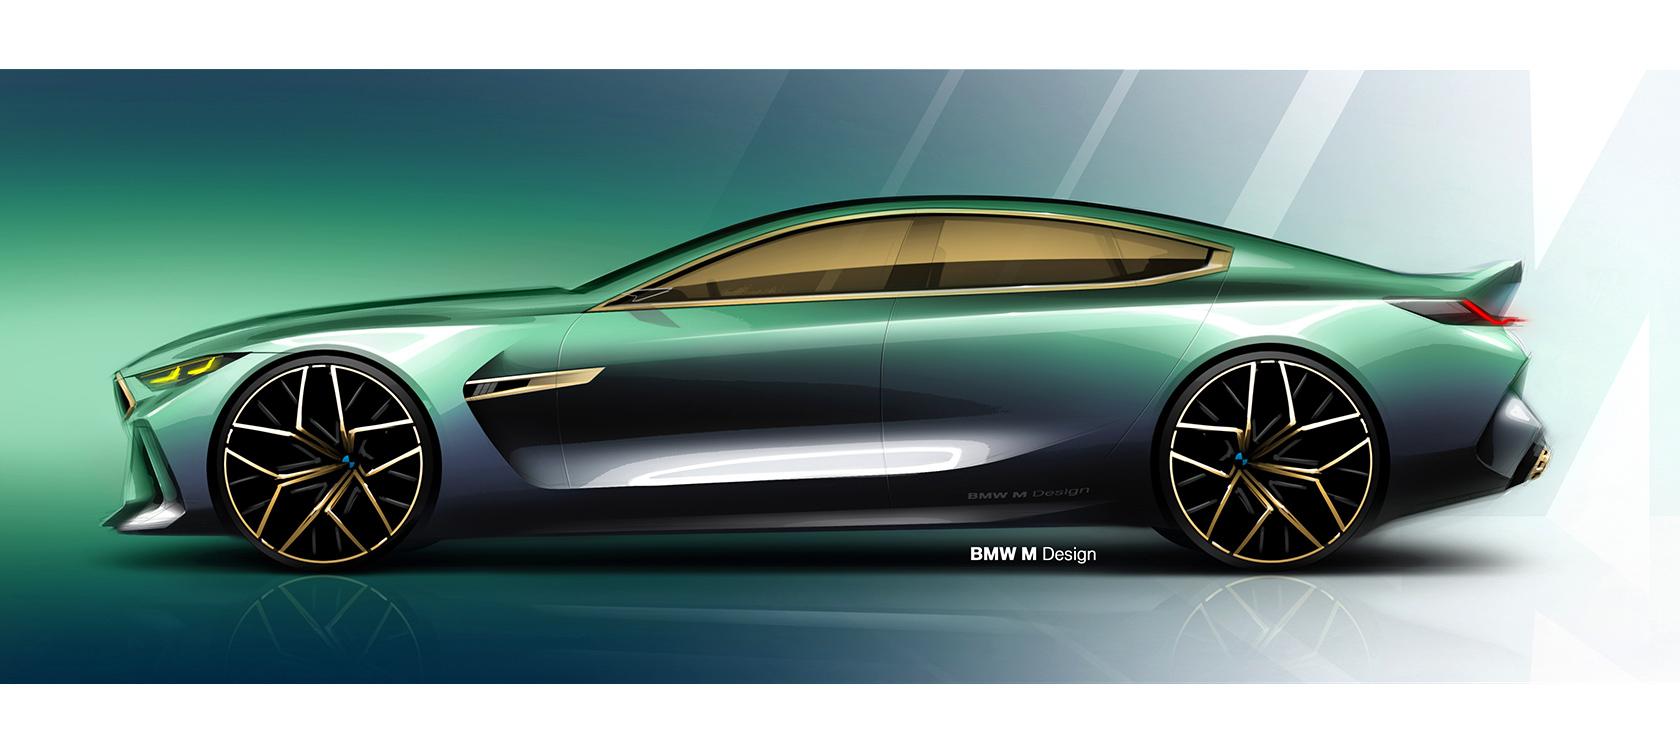 bmw concept m8 gran coupé: high-performance luxury | bmw